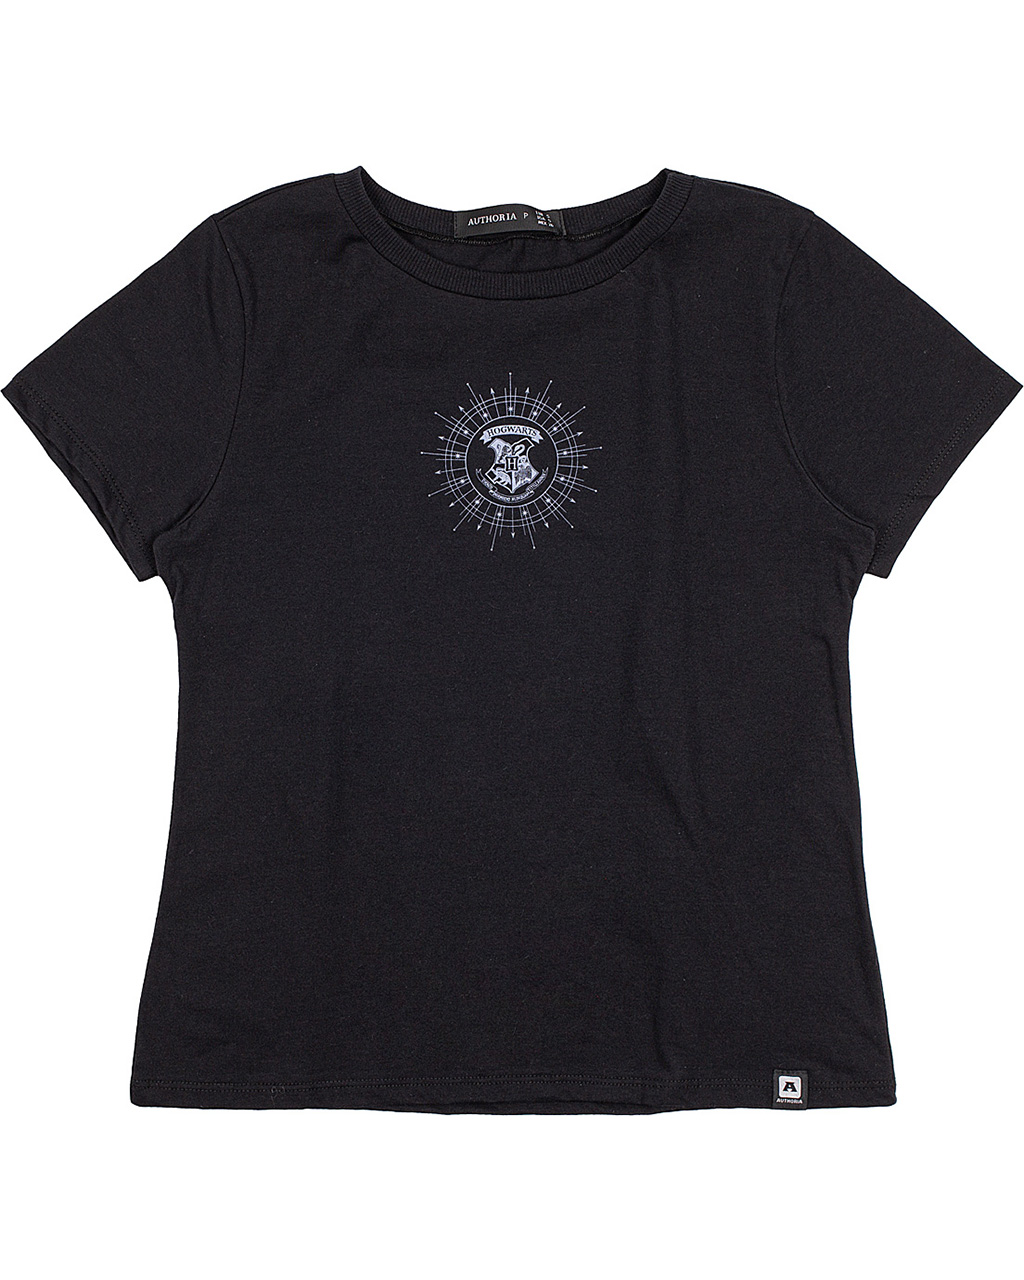 T-Shirt Teen Harry Potter Preta Authoria